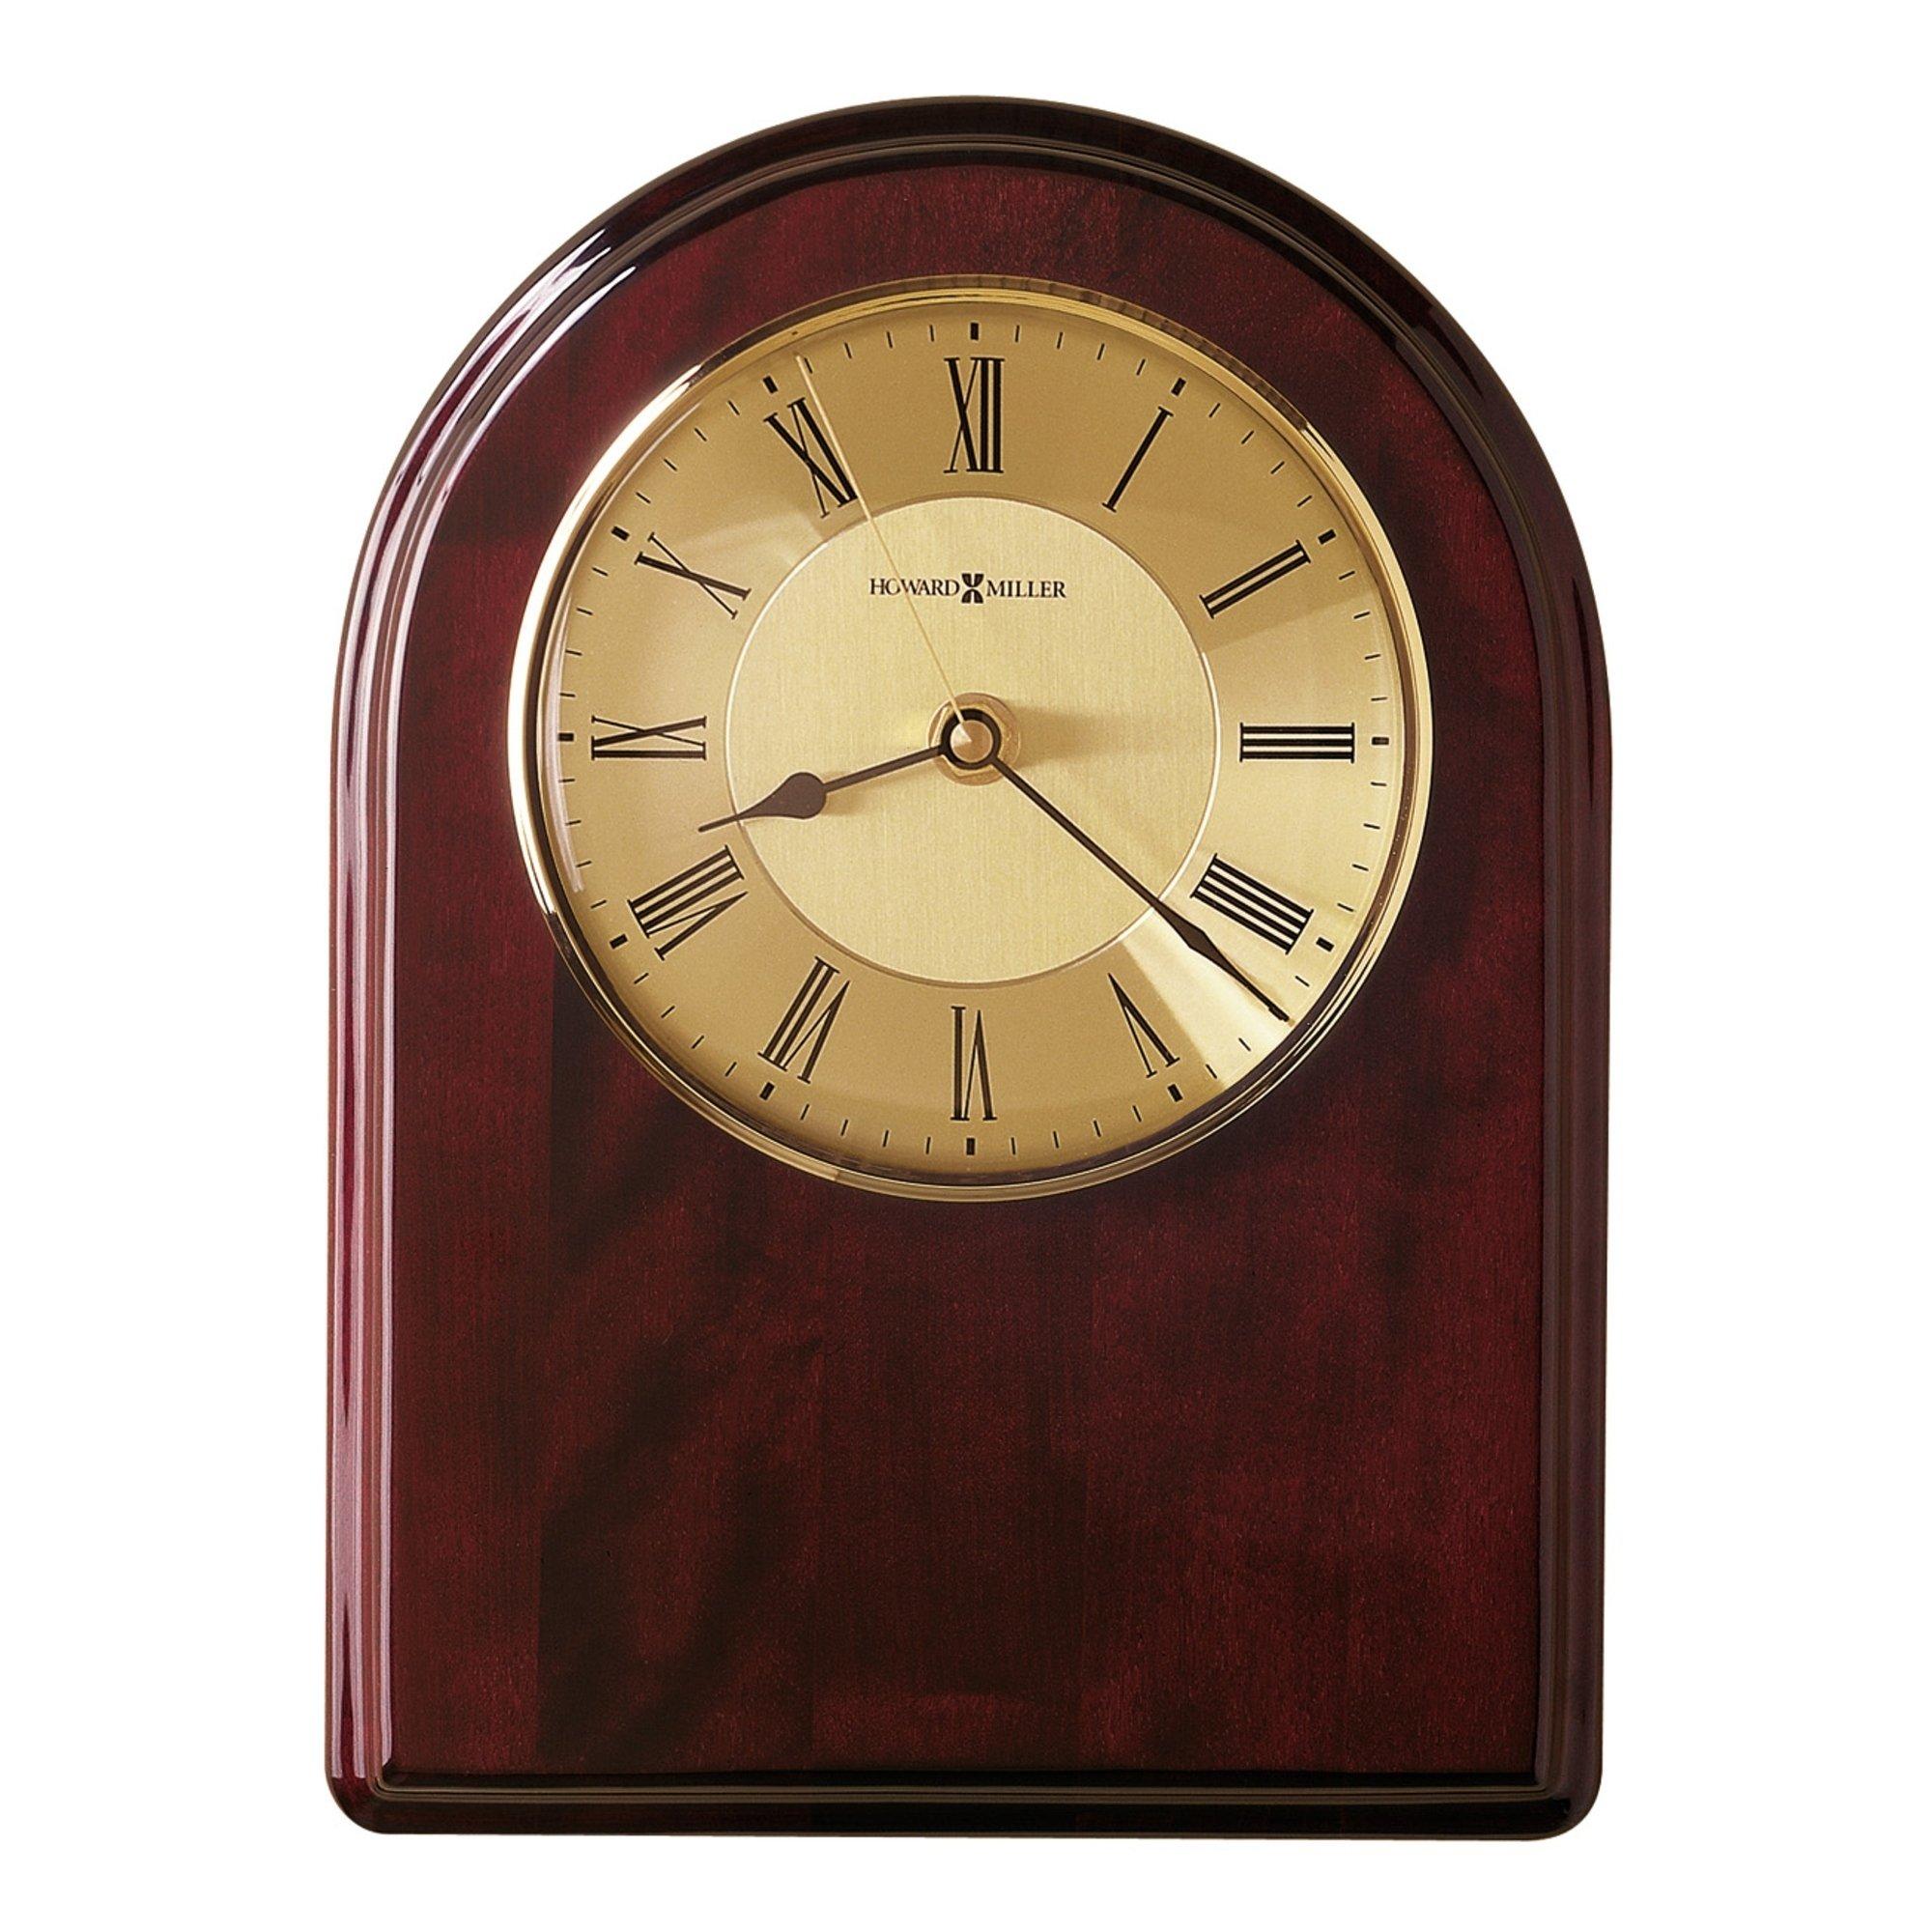 Howard Miller Honor Time Iii Elegant Regal Transitional Wall Clock On Commemorative Plaque Reloj De Pared Black Wood In 2020 Howard Miller Wall Clock Clock Howard Miller